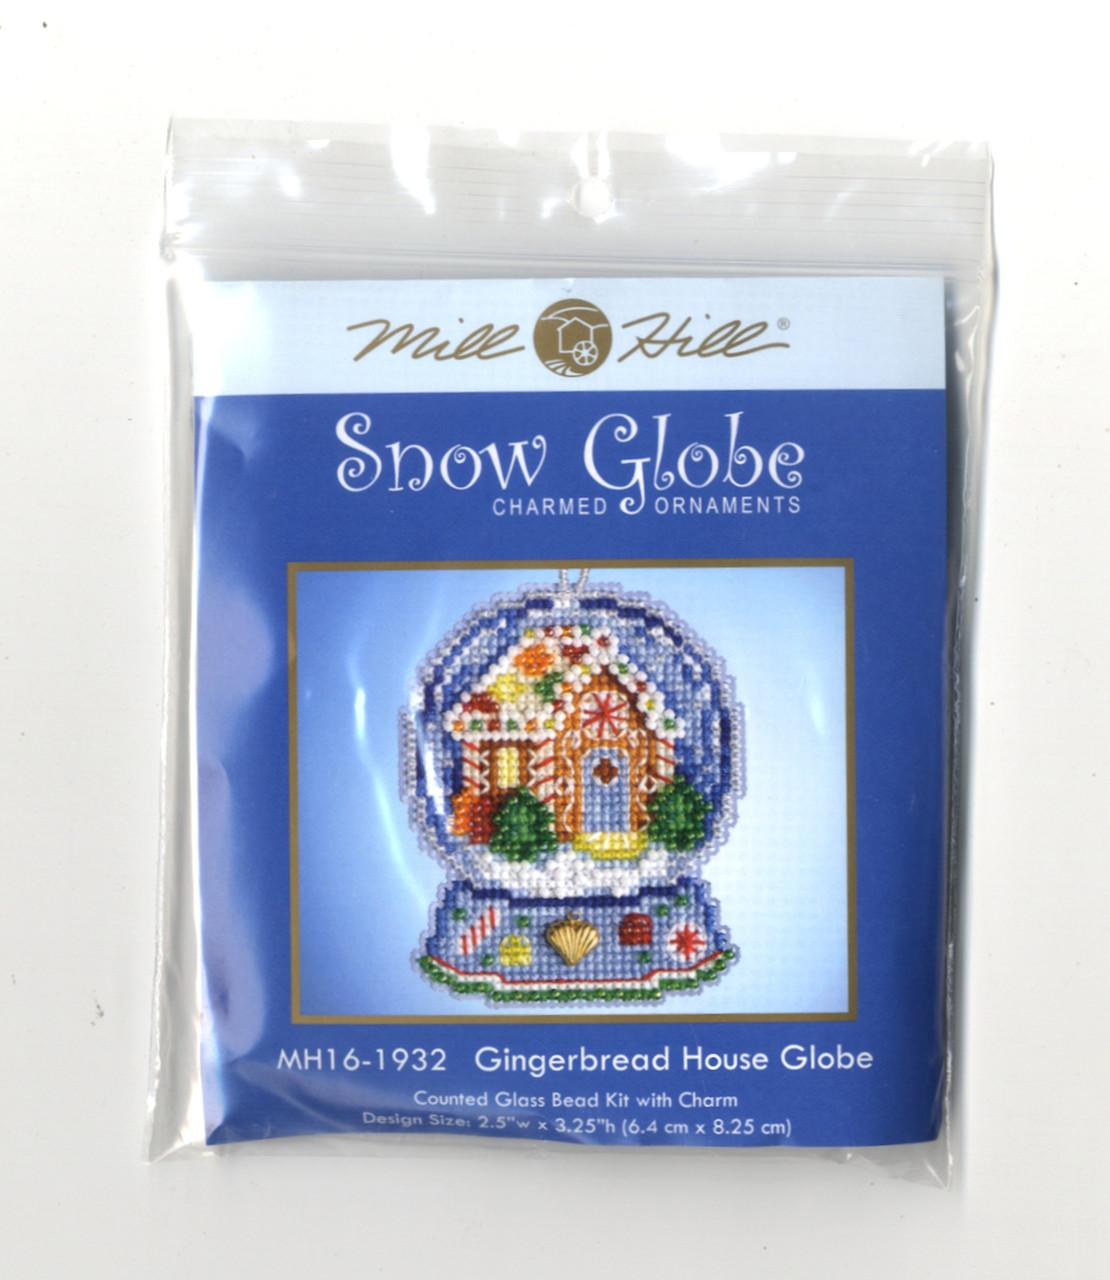 Mill Hill 2019 Snow Globe Charmed Ornament - Gingerbread House Globe